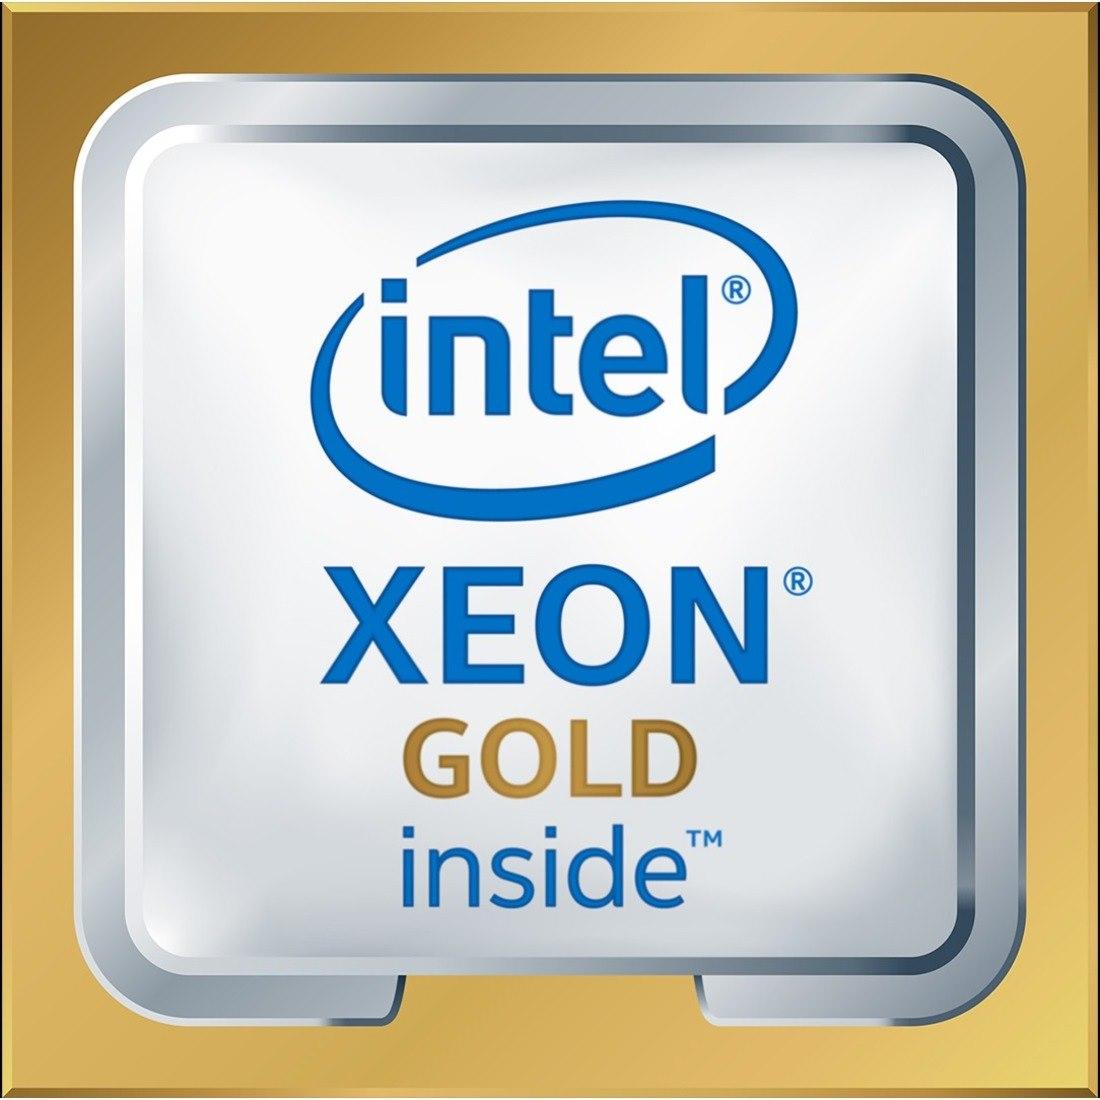 Intel Xeon 6128 Hexa-core (6 Core) 3.40 GHz Processor - Retail Pack